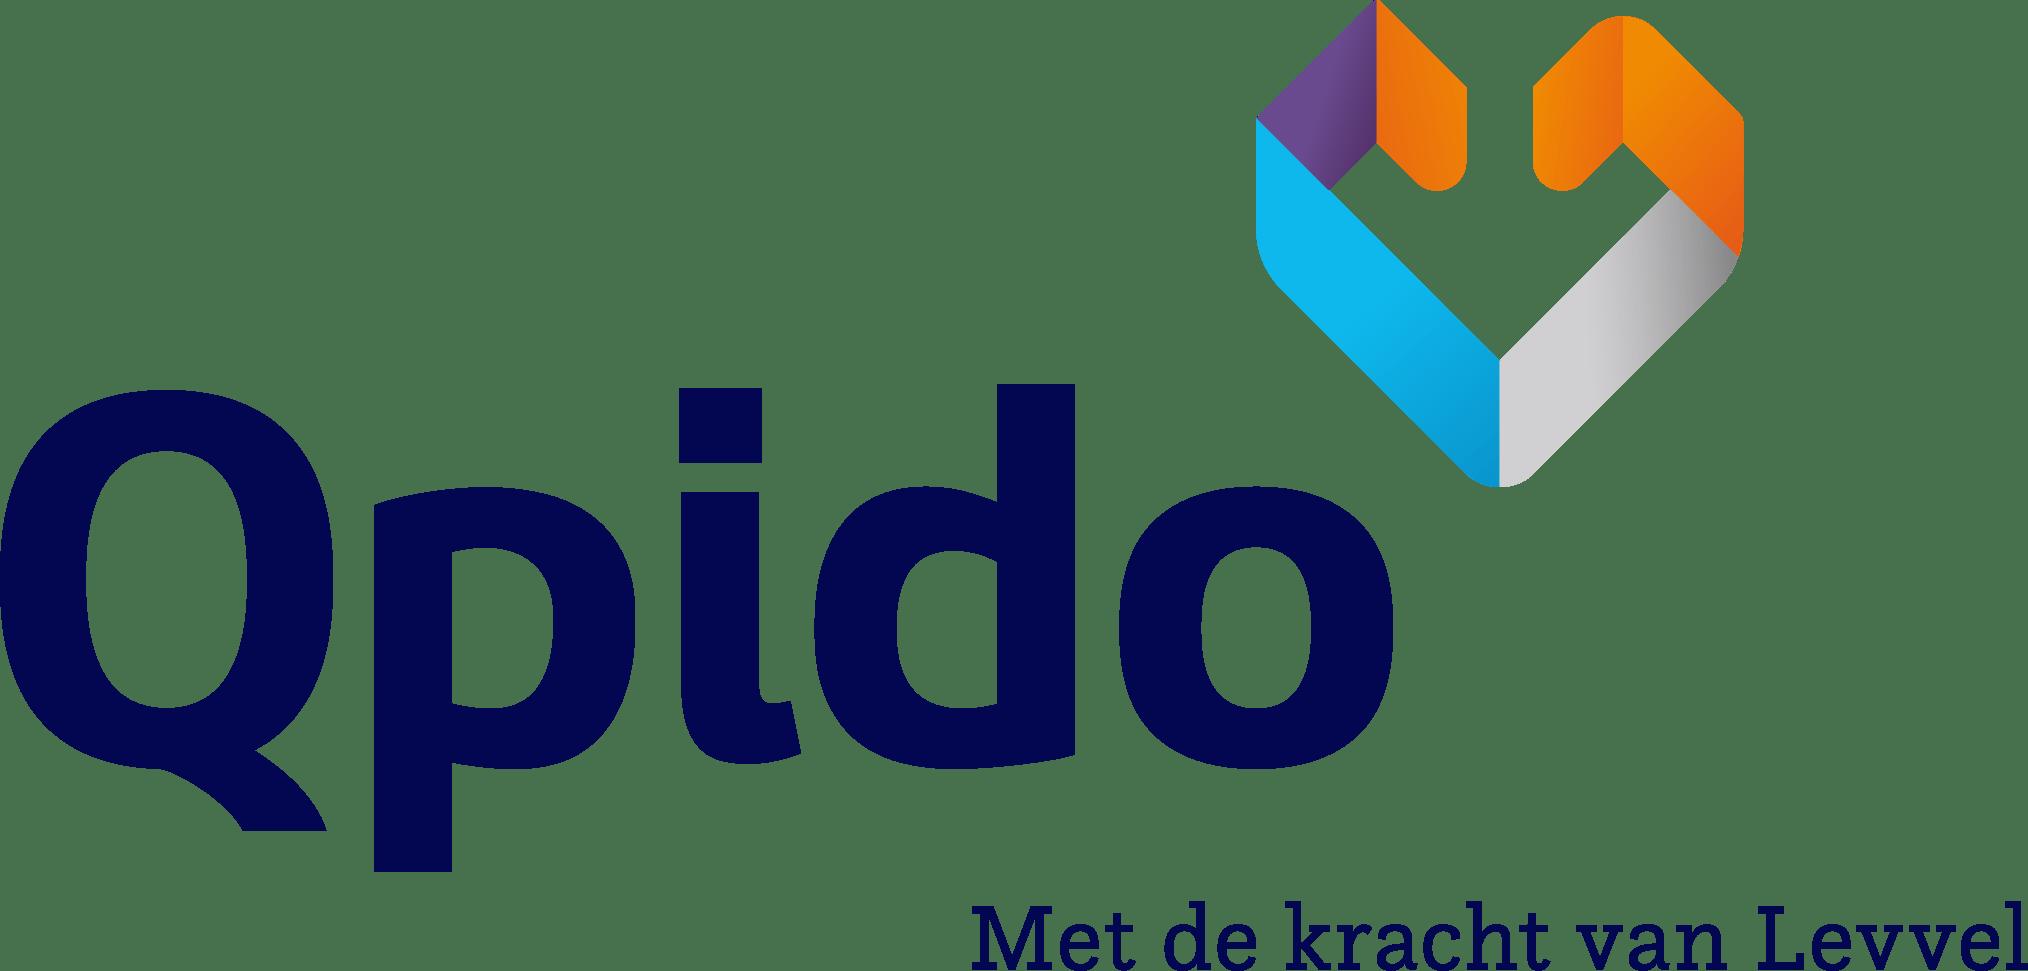 Qpido-Levvel - Endorsement+tagline transparant achtergrond